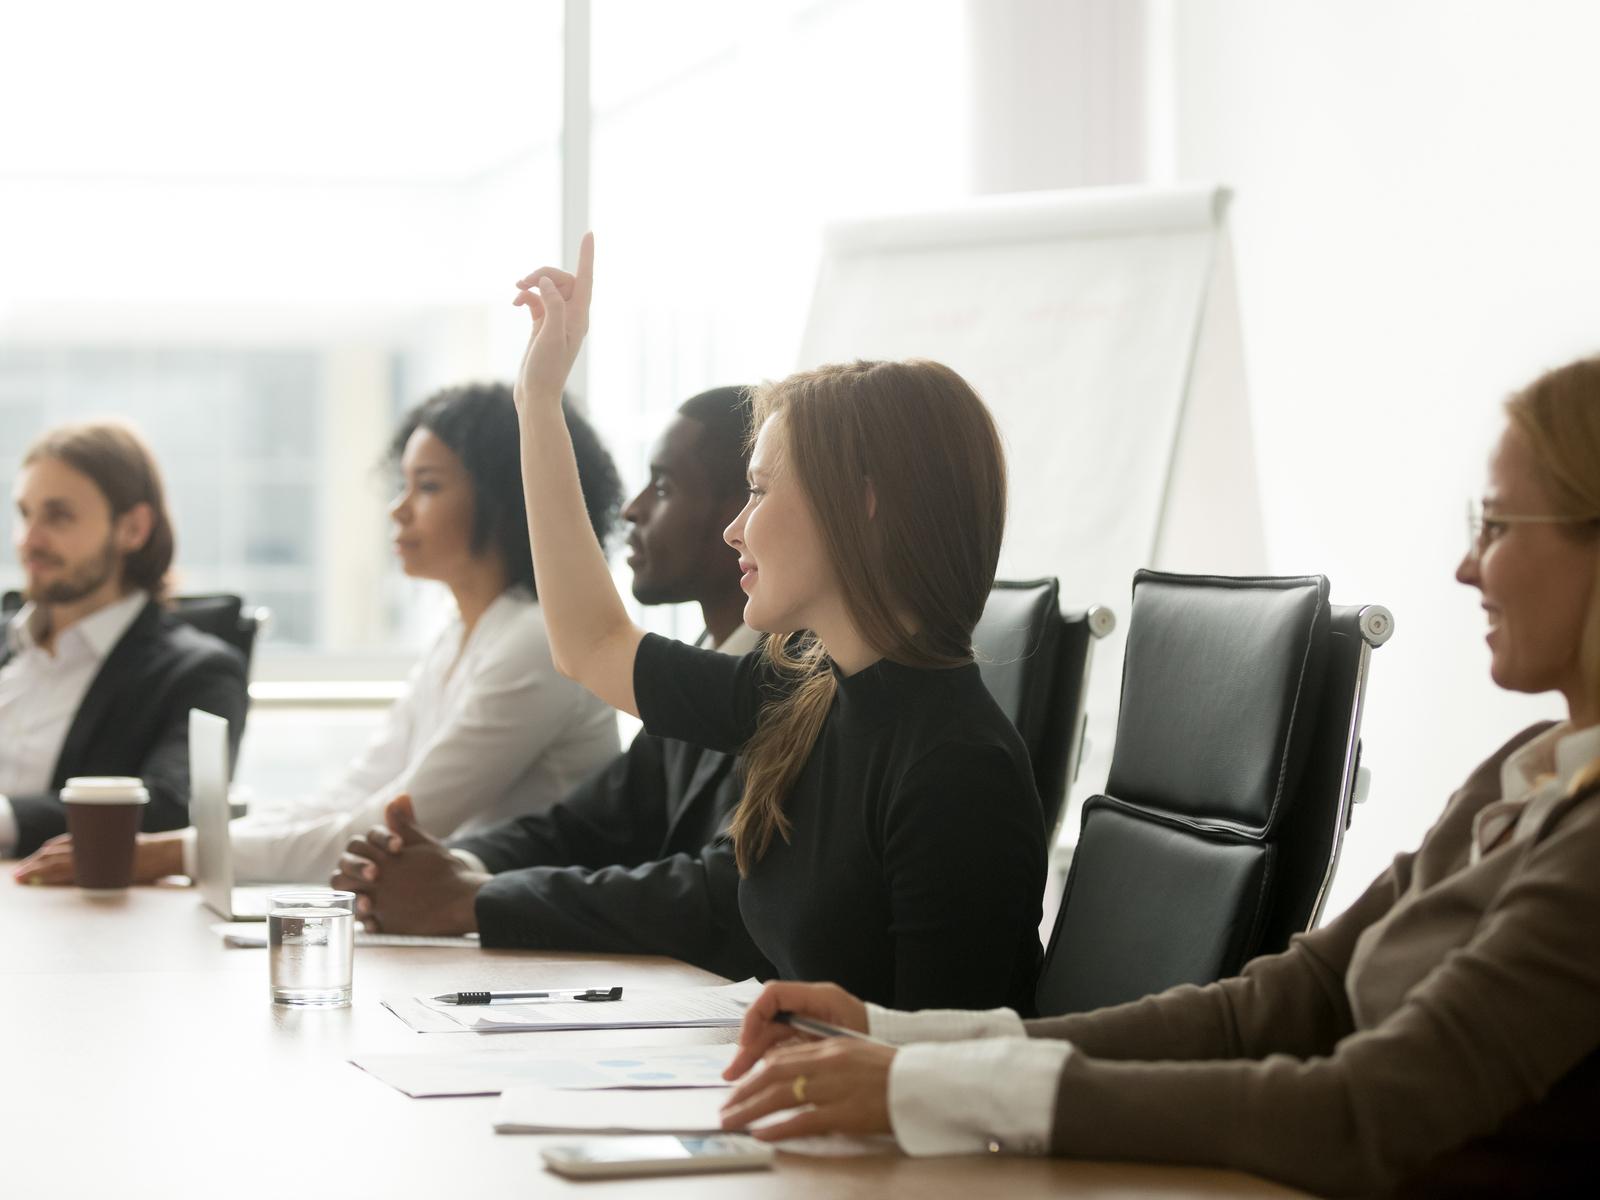 UAE companies take in more women as board members